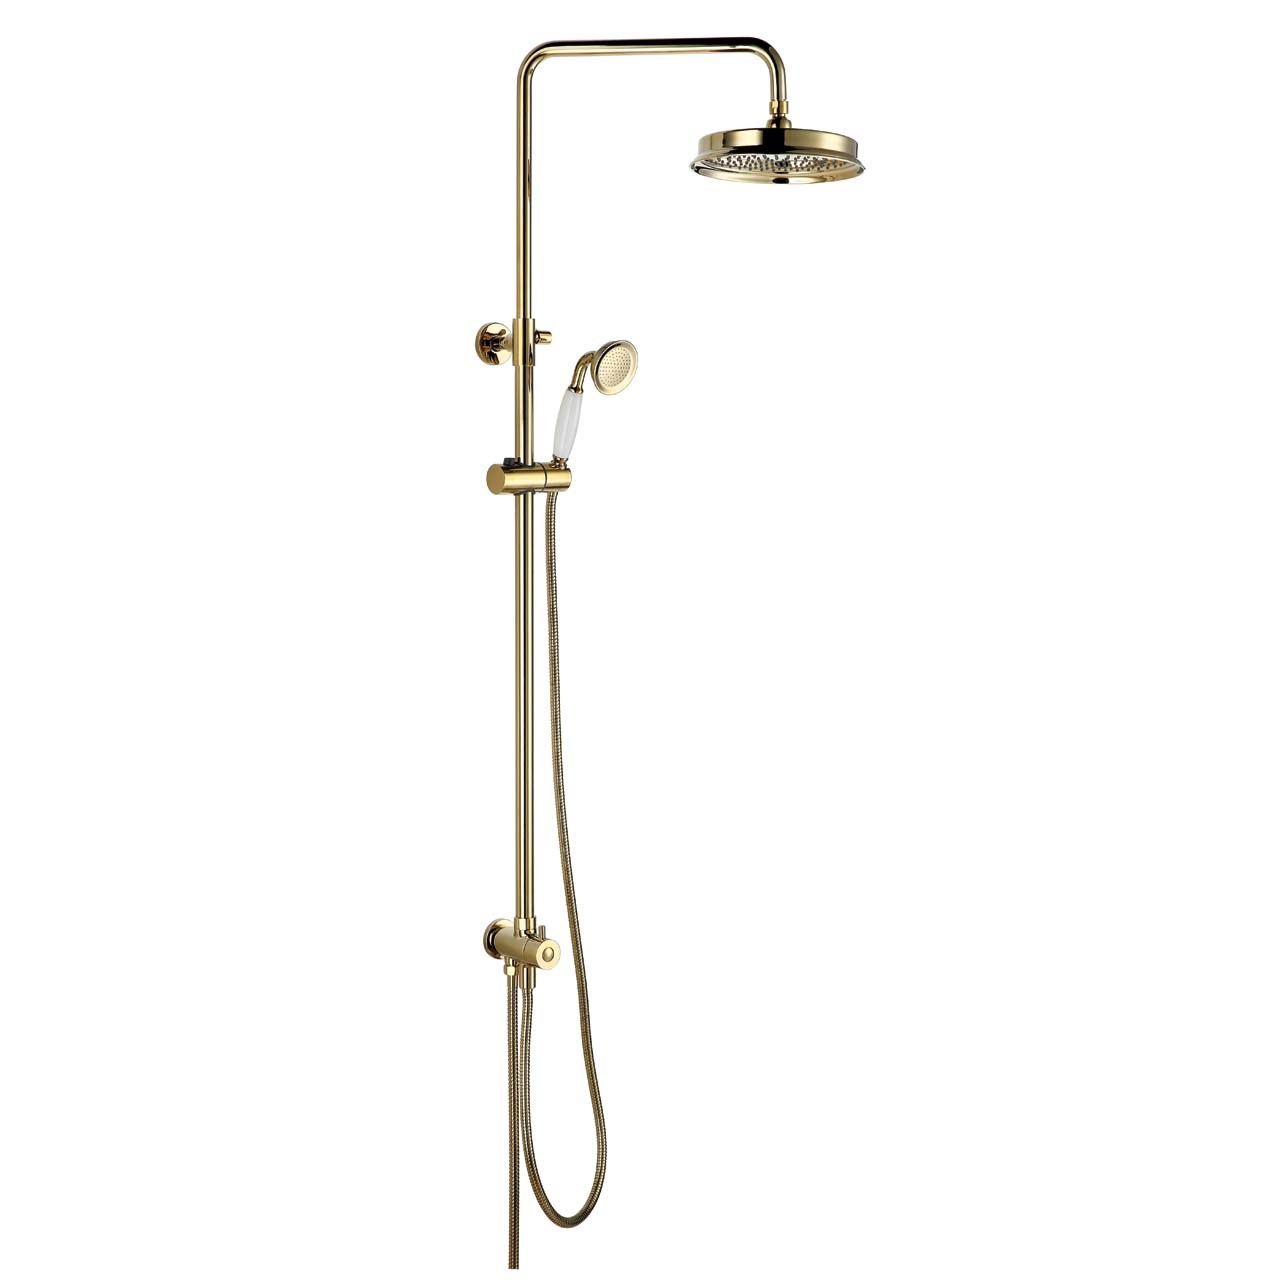 عکس دوش حمام ویسن تین مدل GOLD